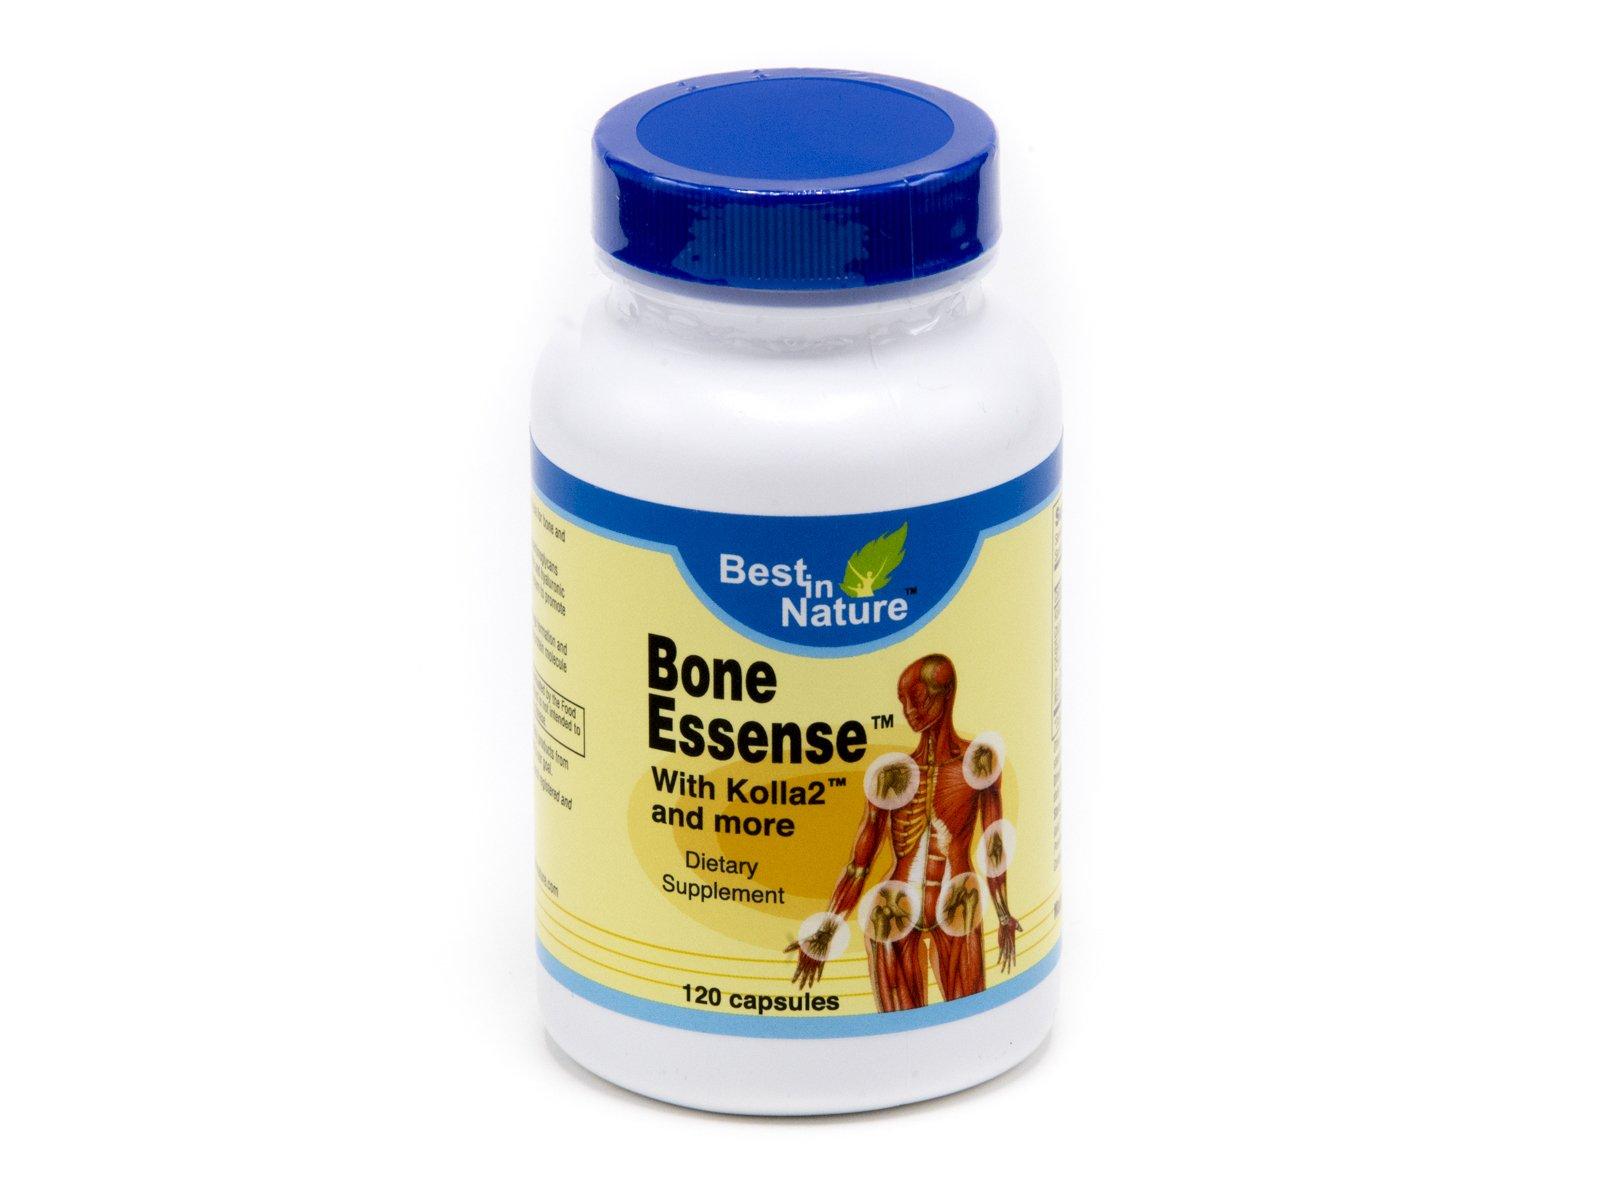 Bone Essense with Kolla2 - Kolla2 300mg, Glucosamine, Chondrotin Sulphate, Calcium - 120 Capsules - Best in Nature (Bundle, Pack of 4)